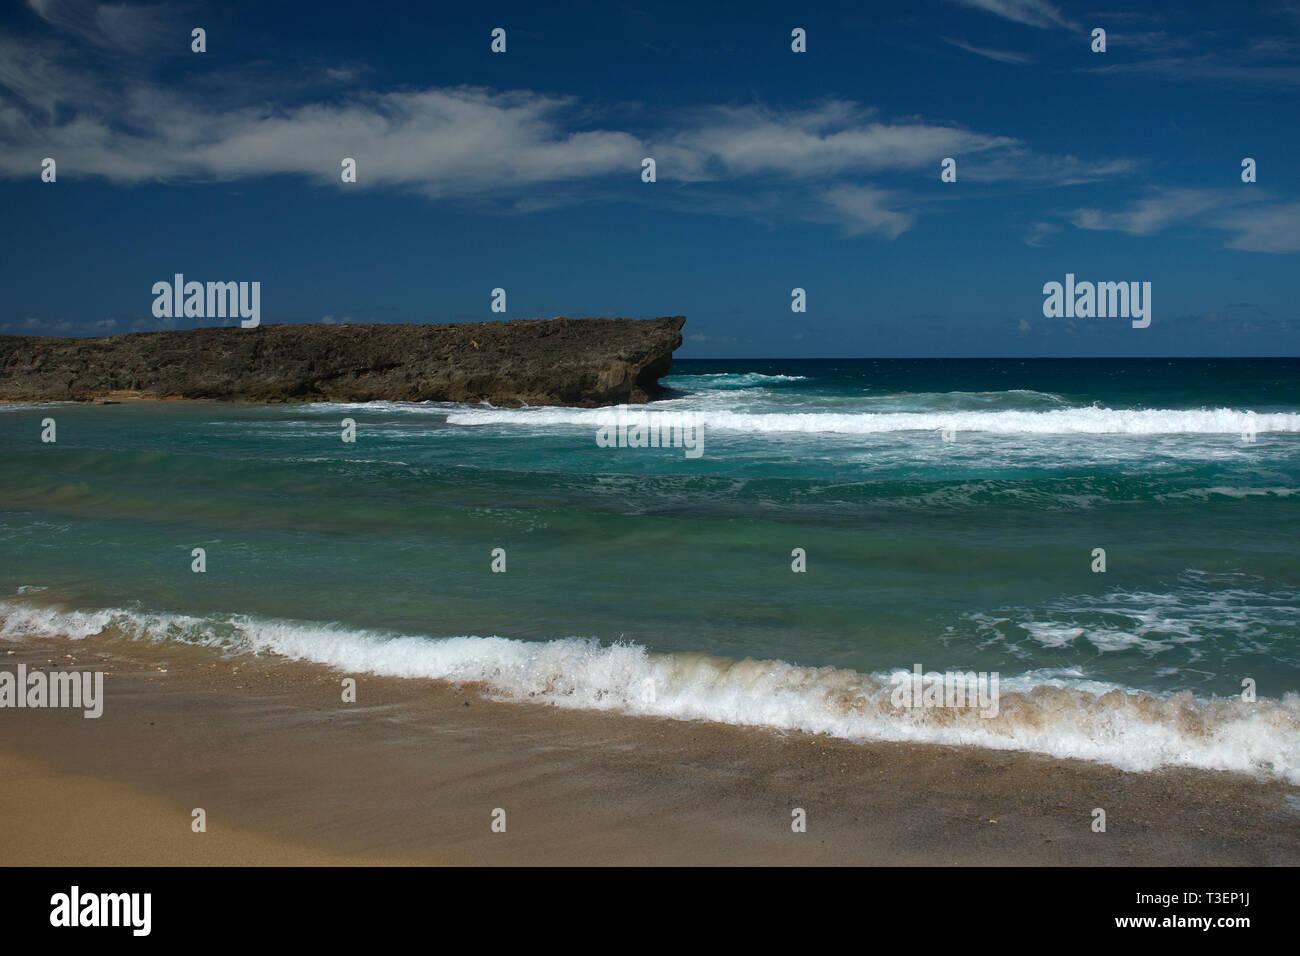 Manati, Puerto Rico Coast - Stock Image